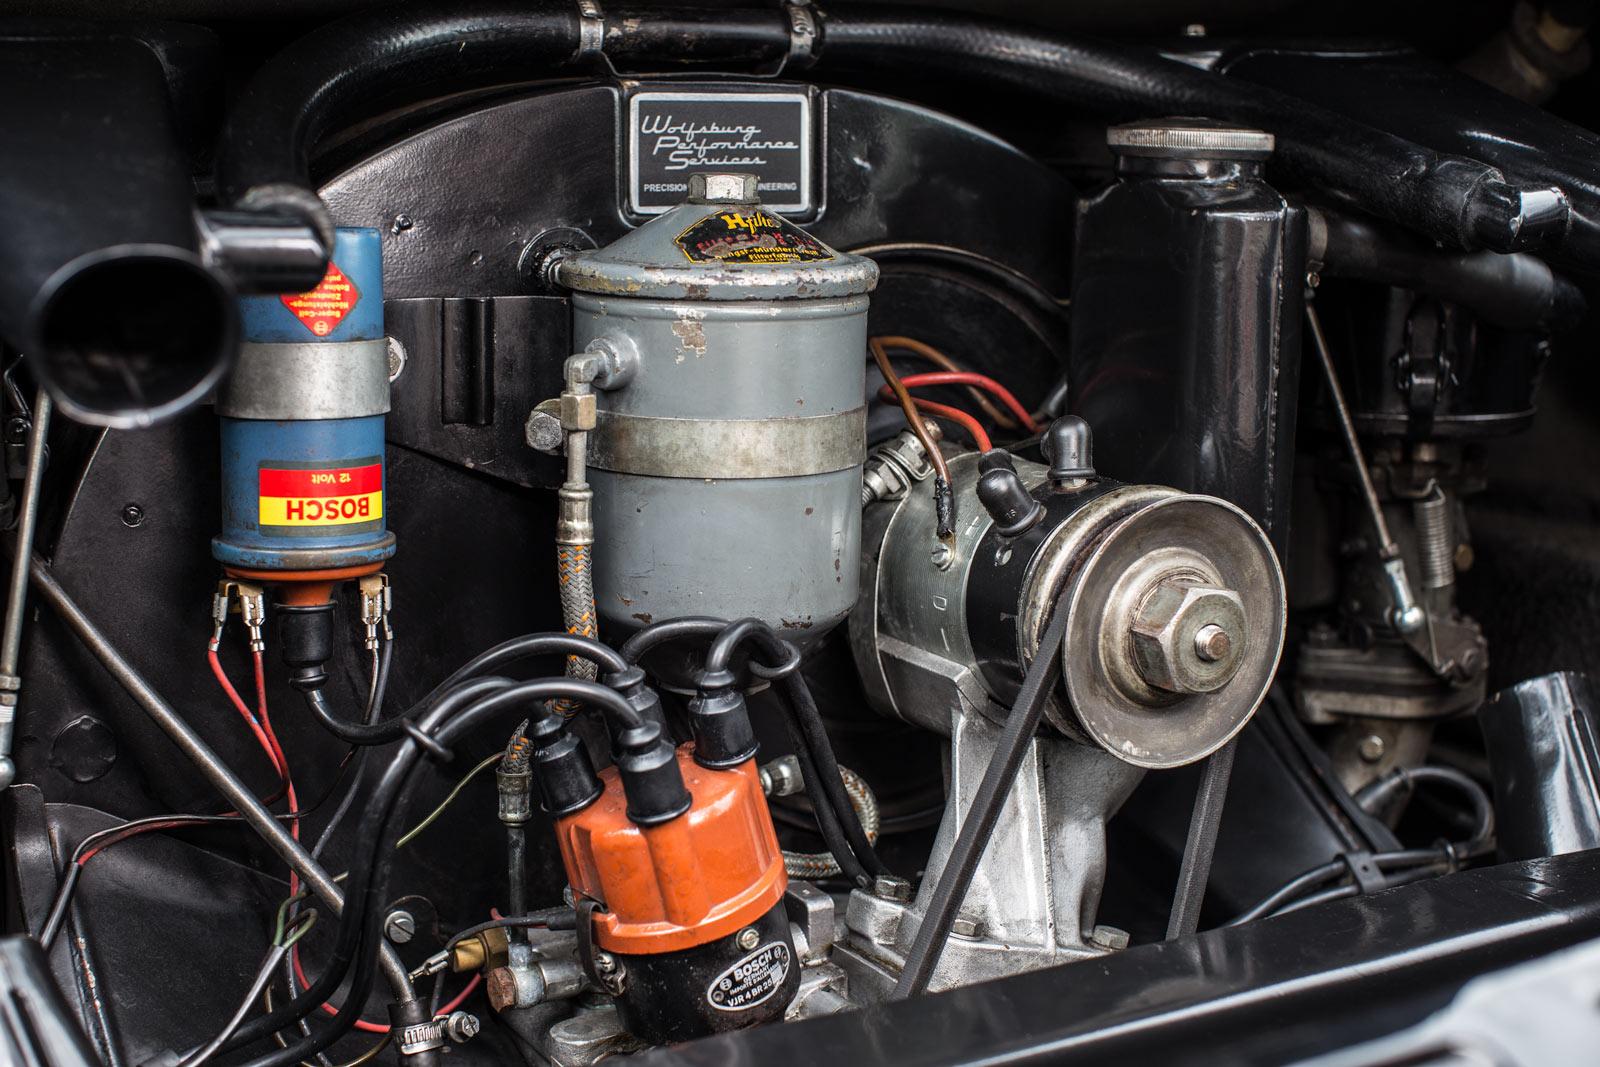 912 Engine Software Help 1968 Porsche Diagram 1967 Service And Set Up Factory Spec Rebuild Or Improvement In Horsepower Handling For